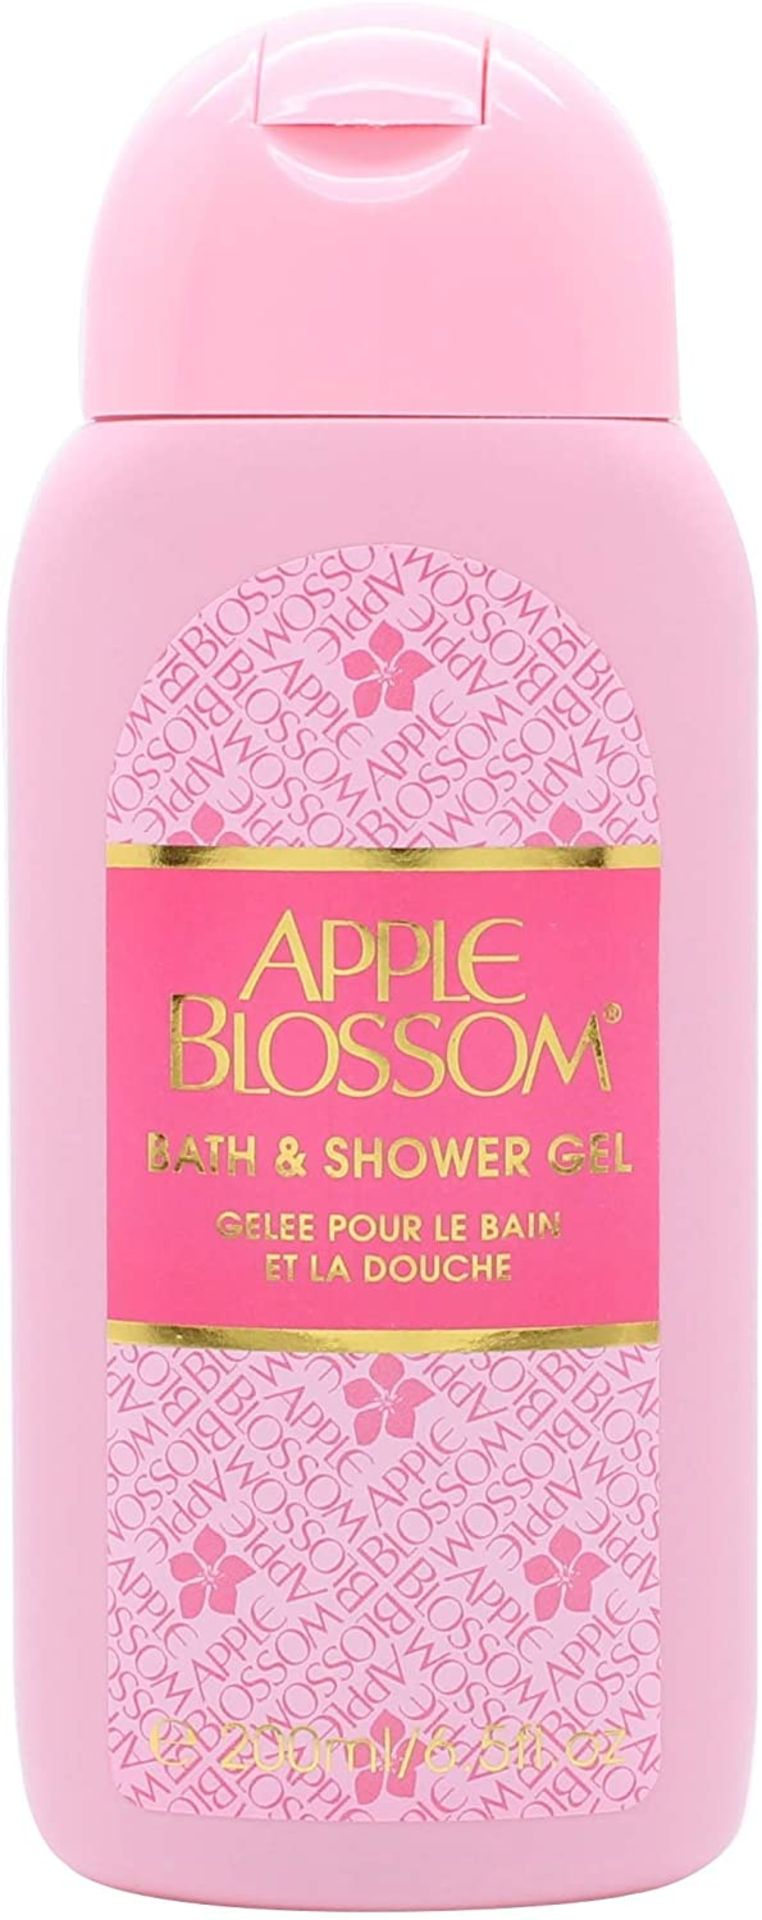 + VAT Brand New Apple Blossom 200ml Bath and Shower Gel